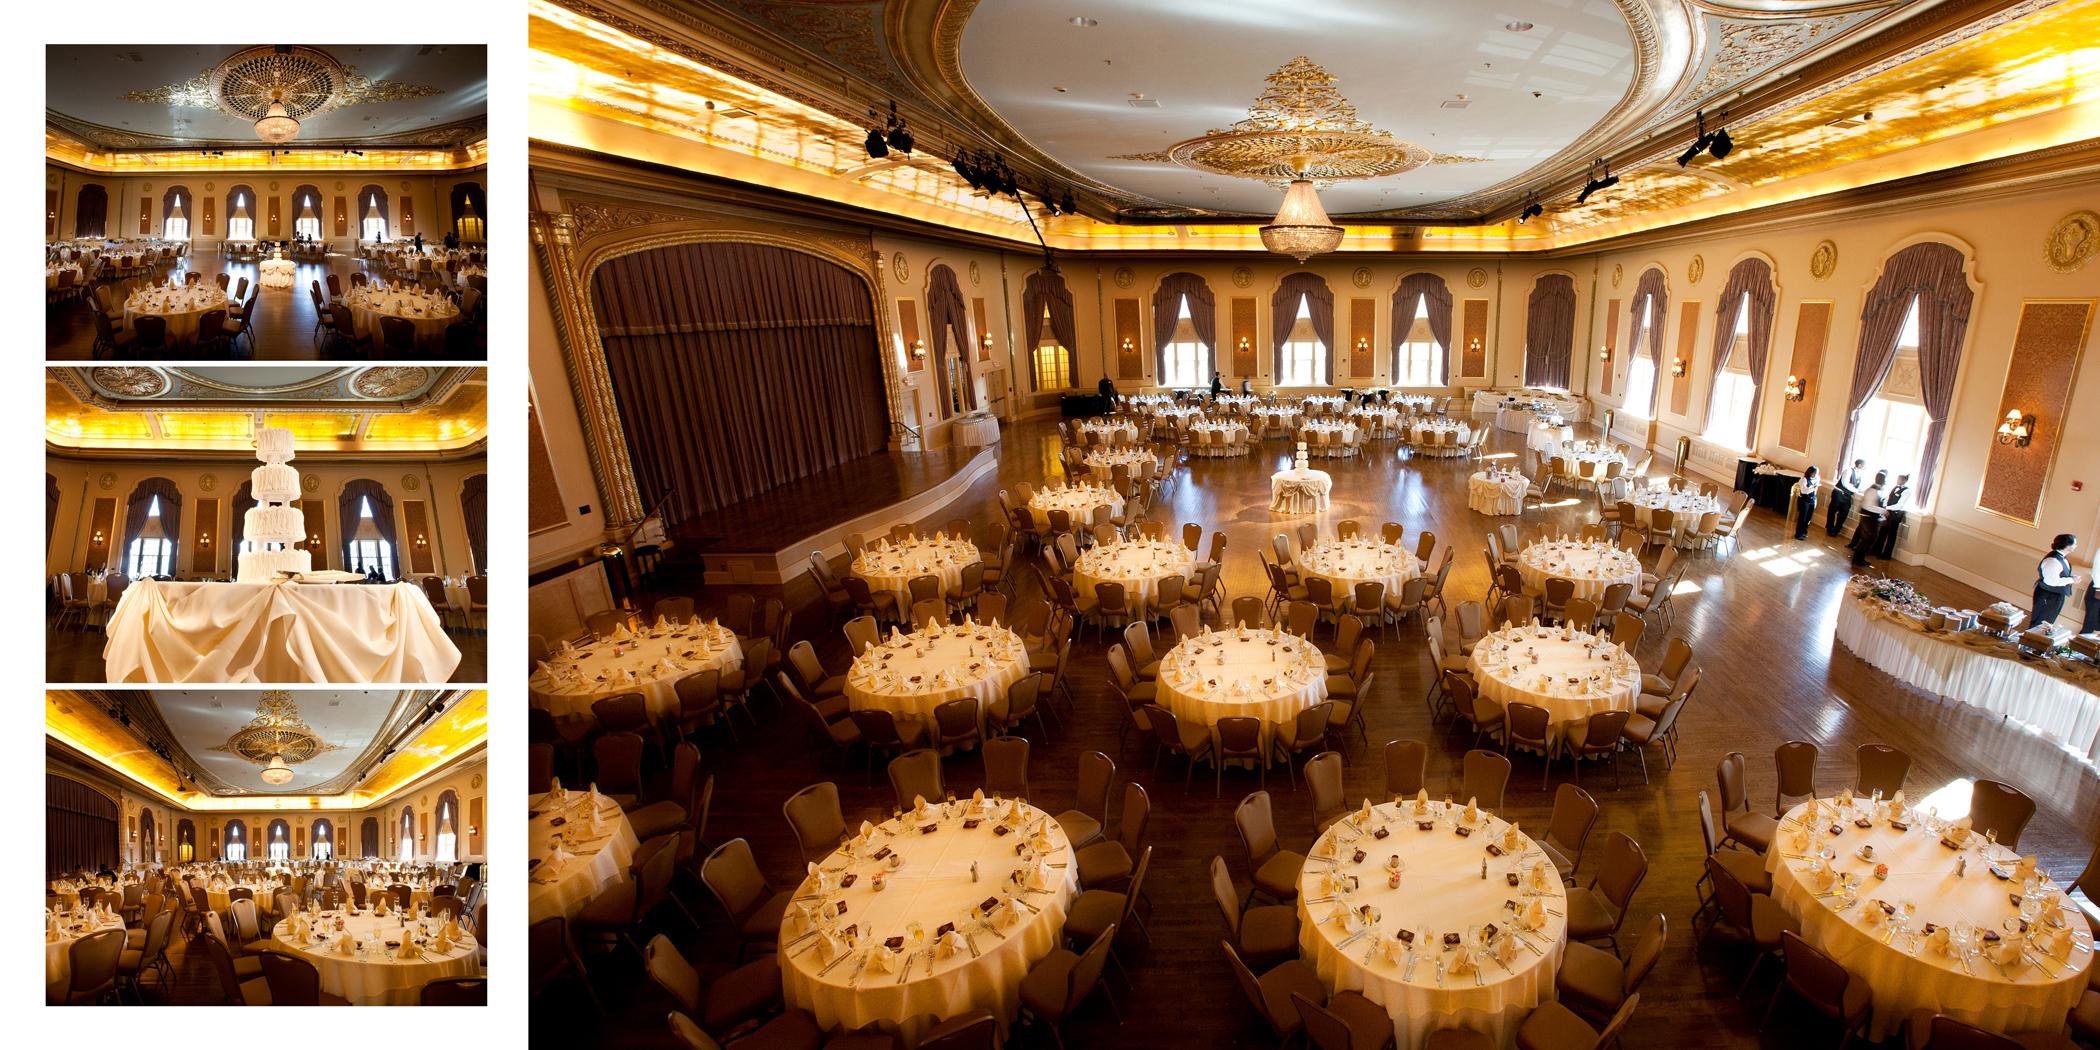 Wedding-Photography-Palaise-Royale-South-Bend-Indiana_22.jpg